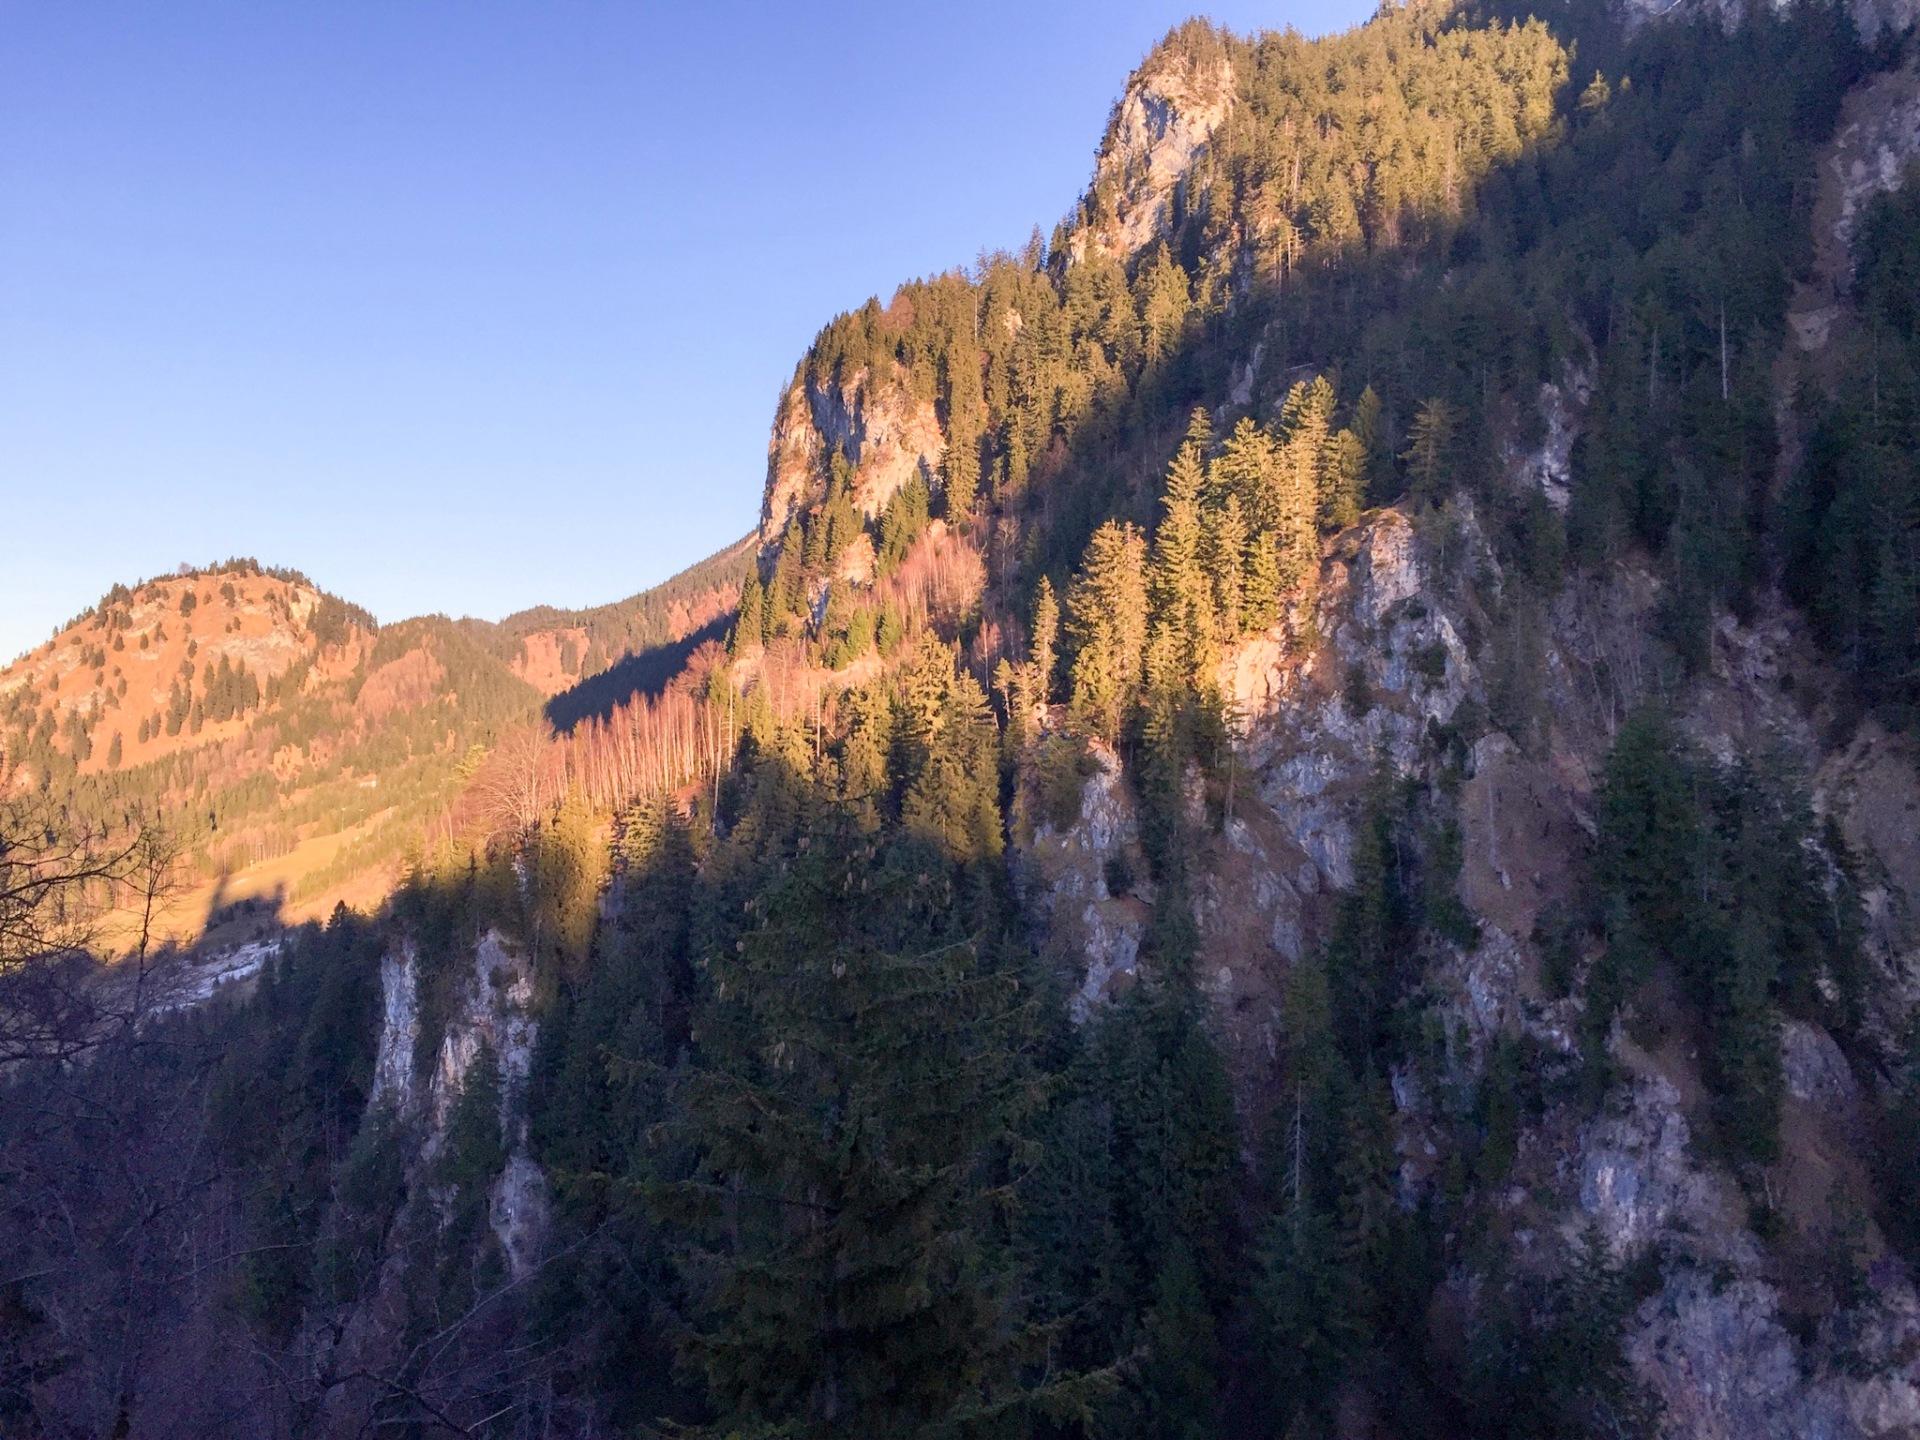 Bavarian mountains, Germany